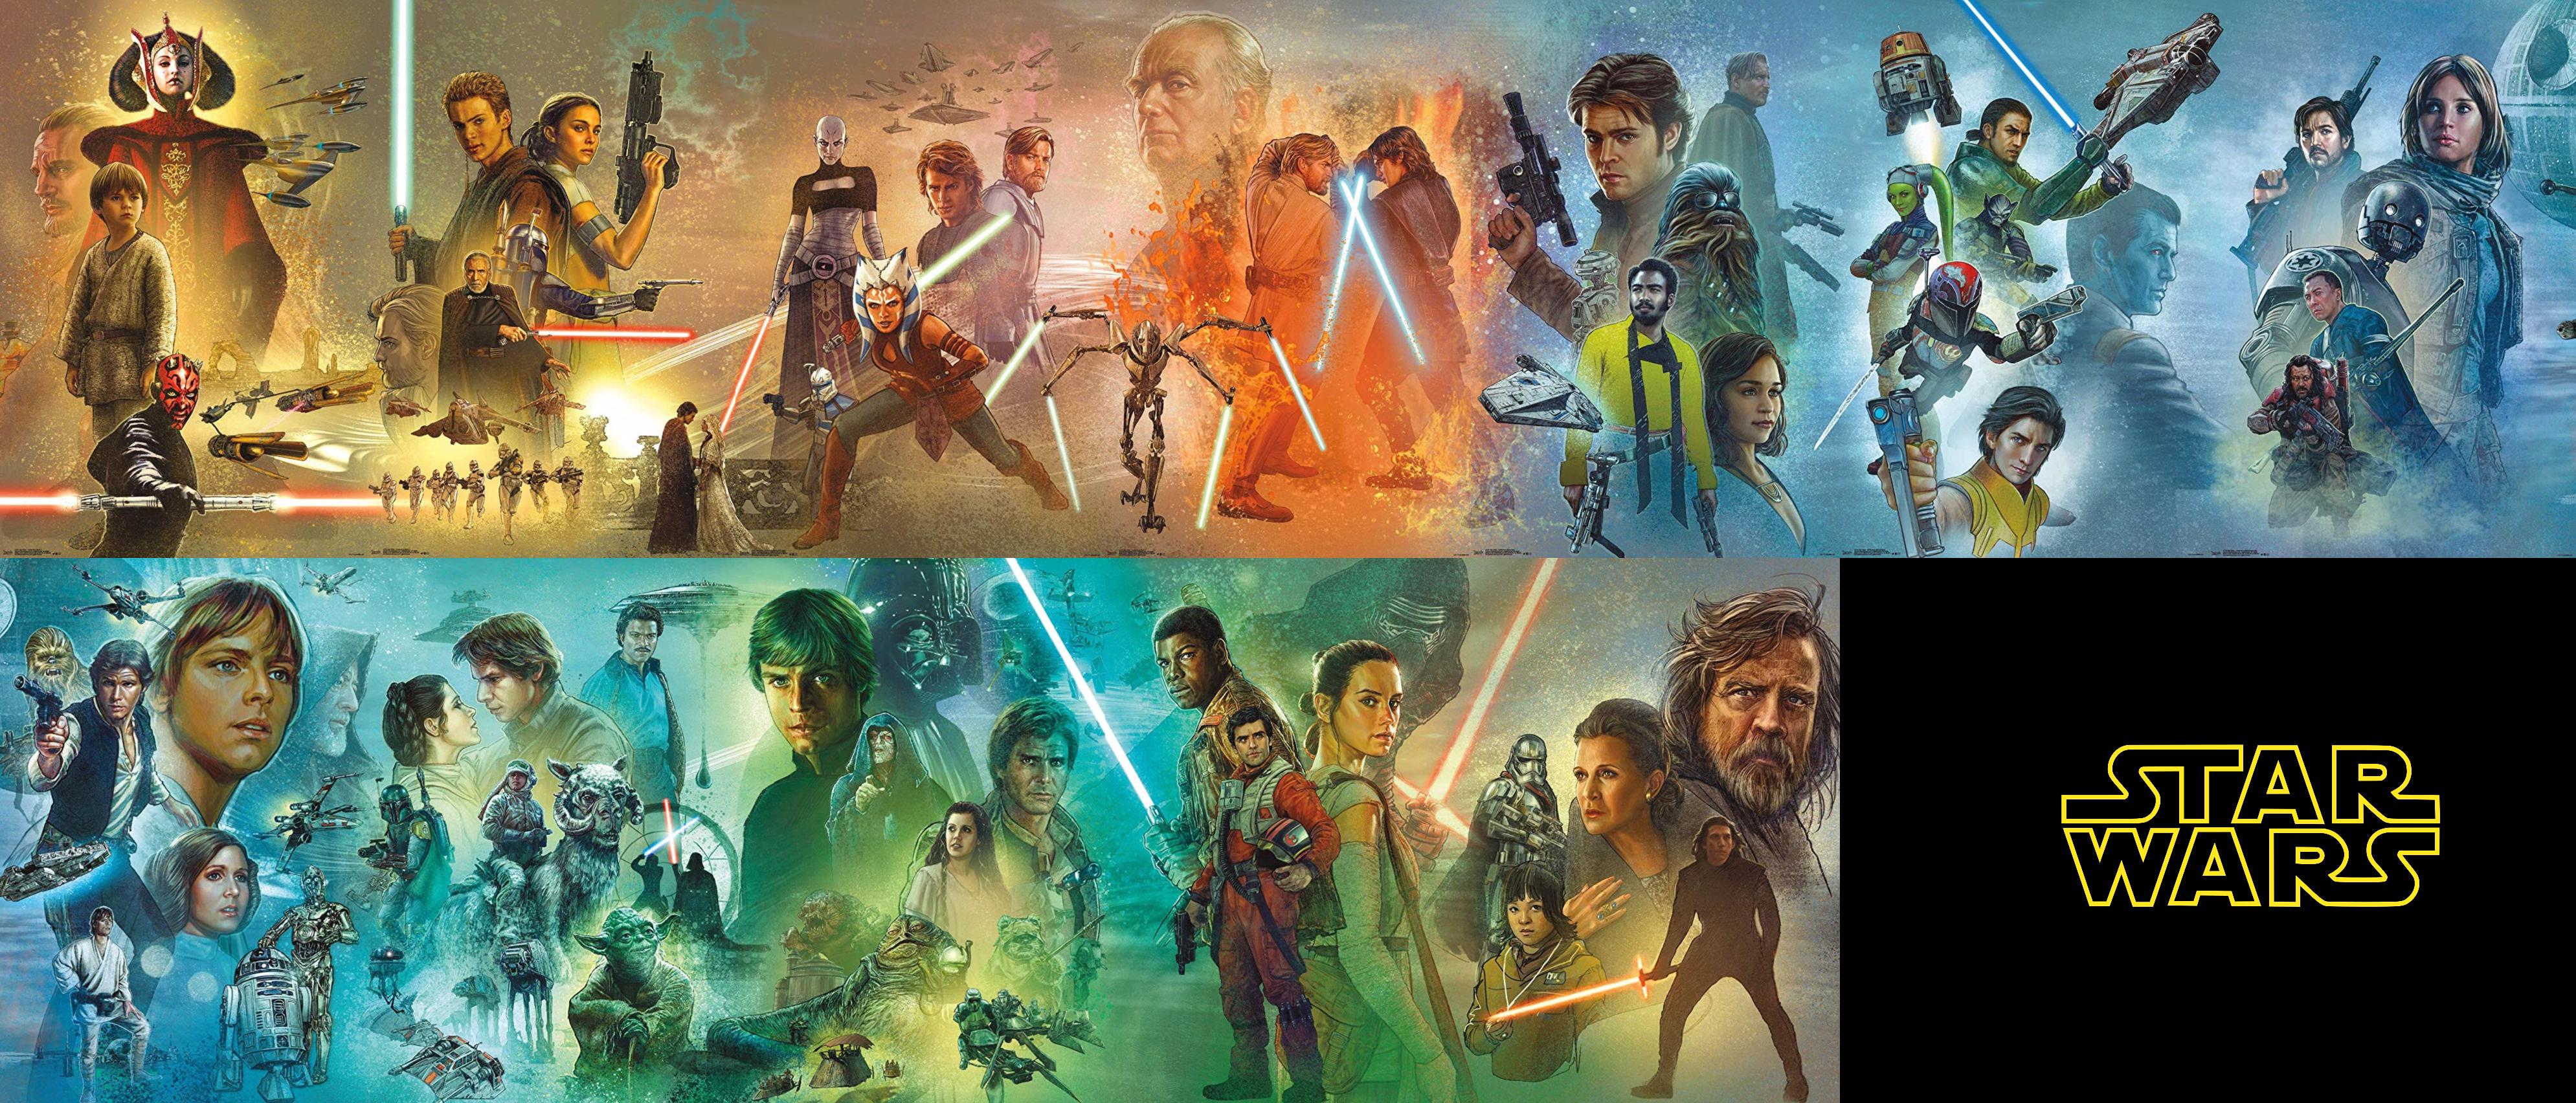 Star Wars Celebration Mural 2927321 Hd Wallpaper Backgrounds Download